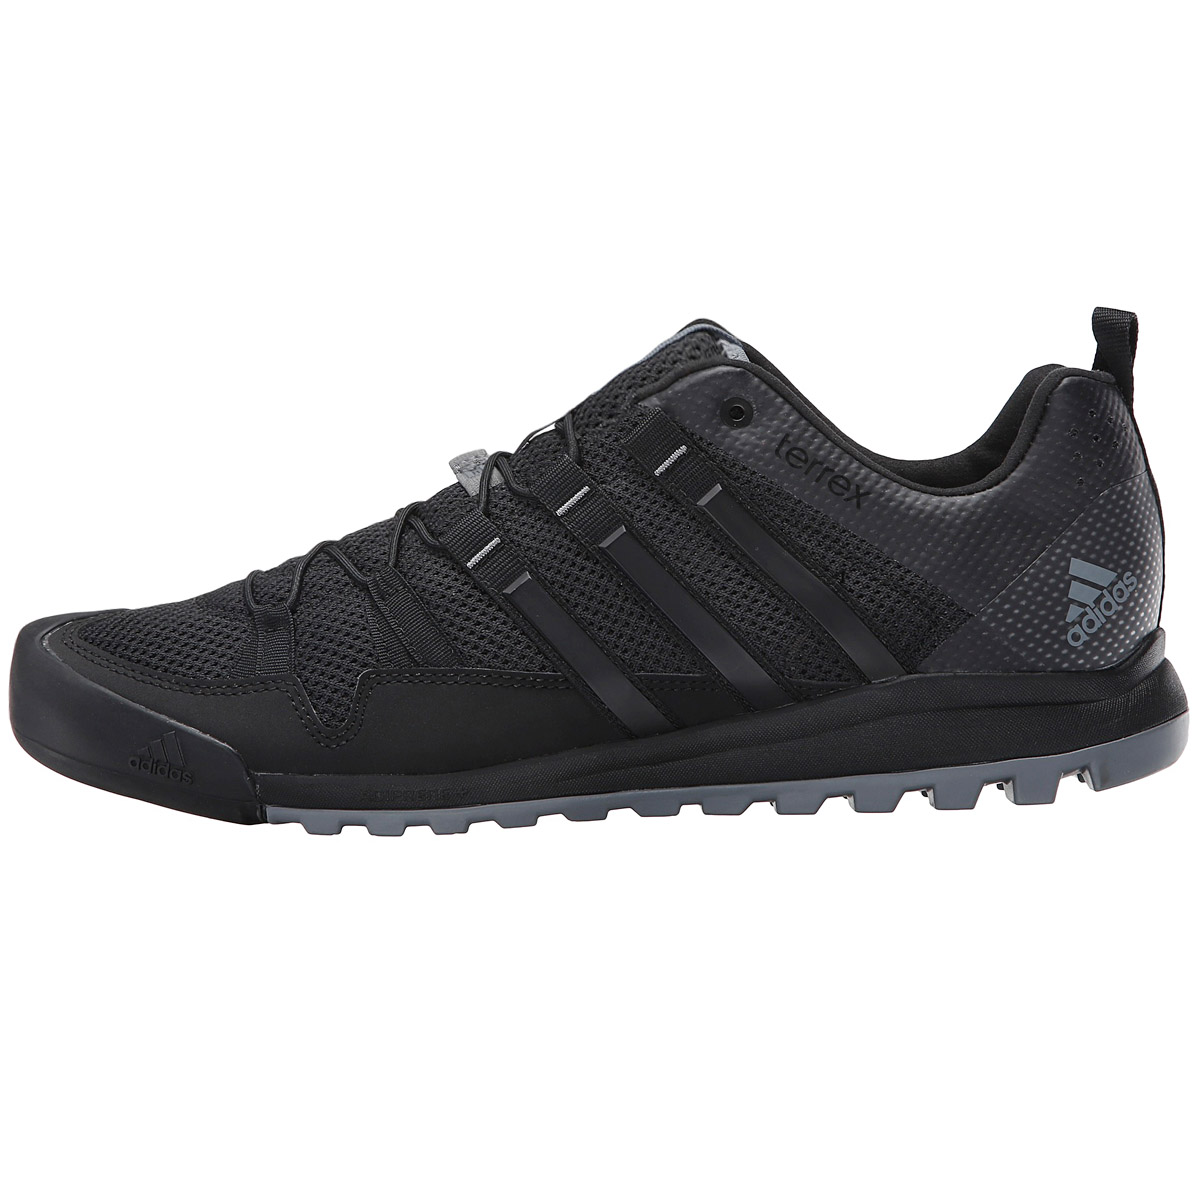 adidas terrex black mens climbing shoes hiking boots